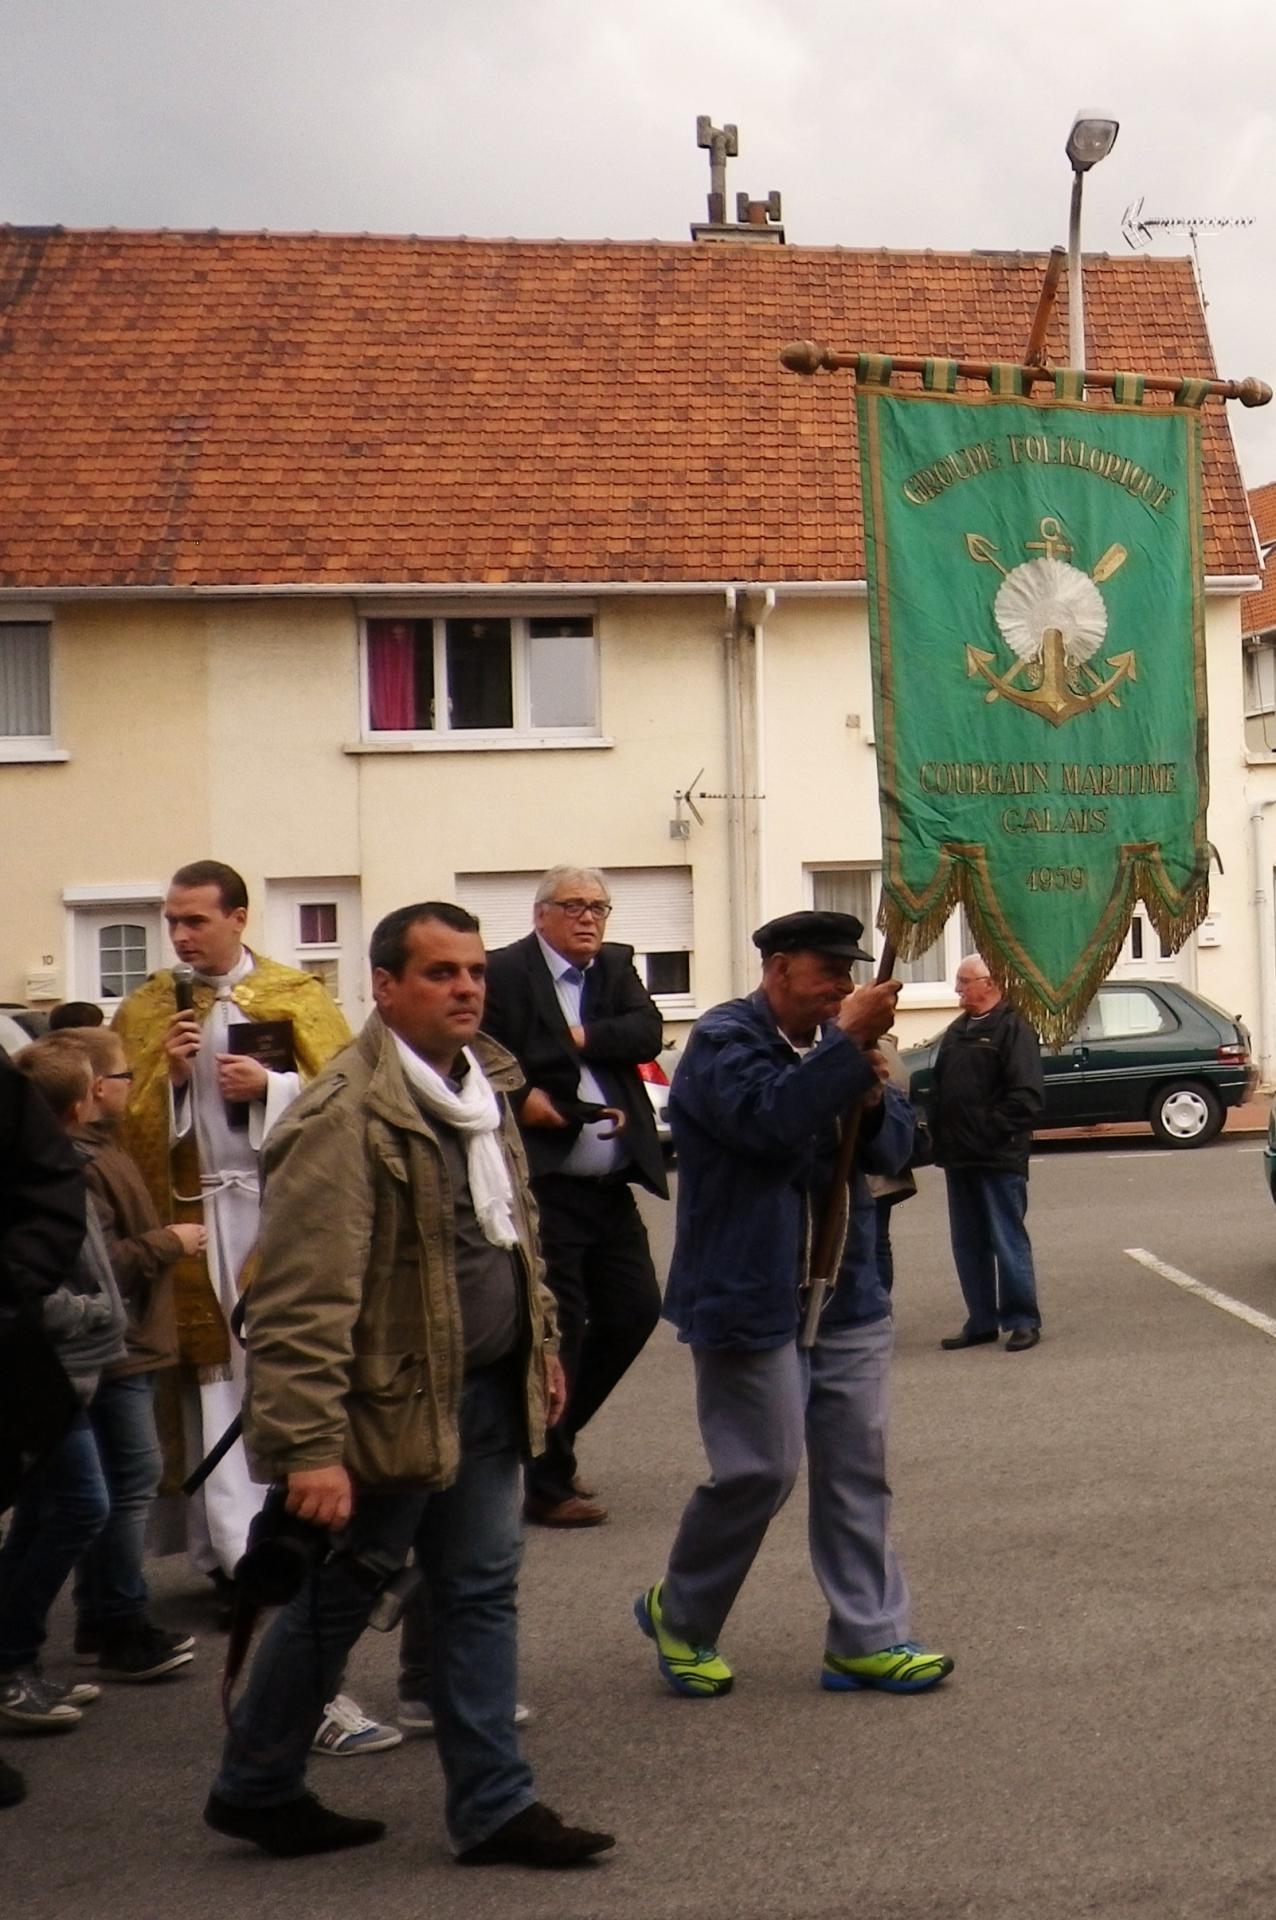 Calais benediction de la mer grand pere porte la banniere du courgain